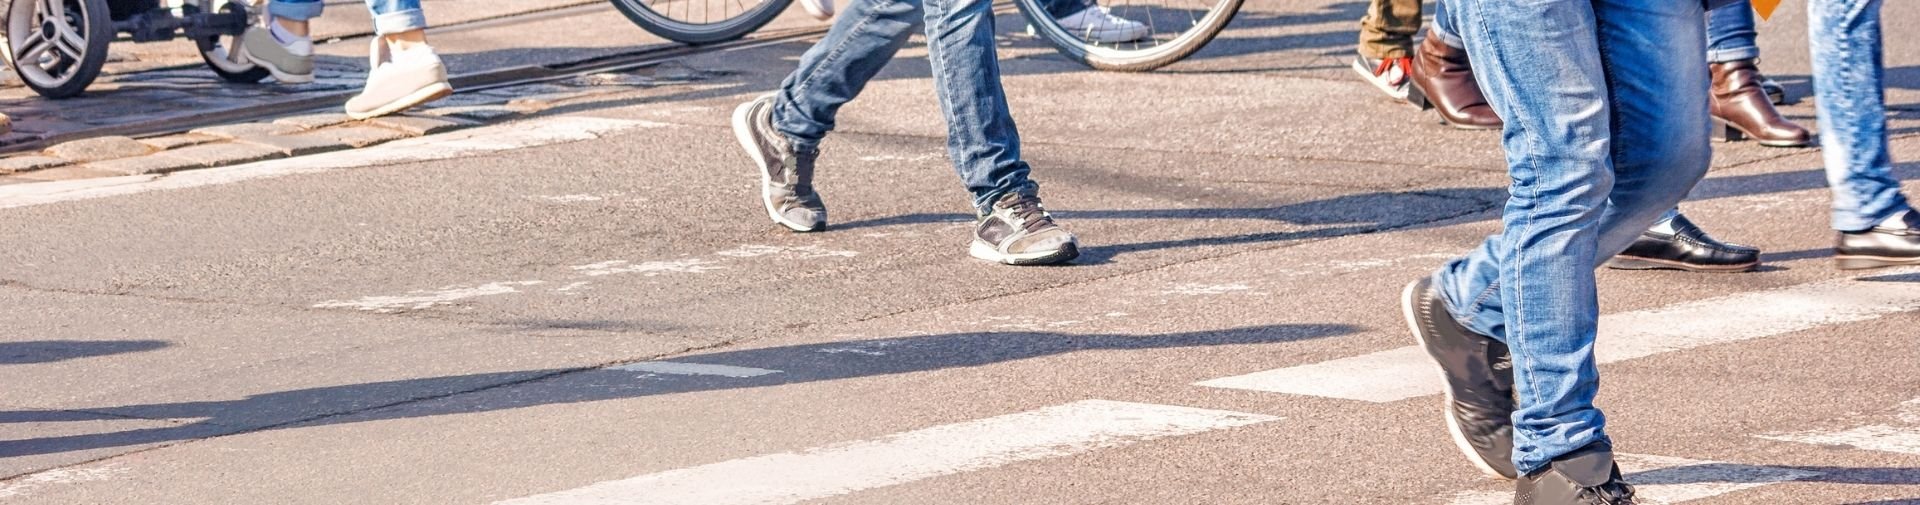 Pedestrian Accident Compensation Claim Solicitors